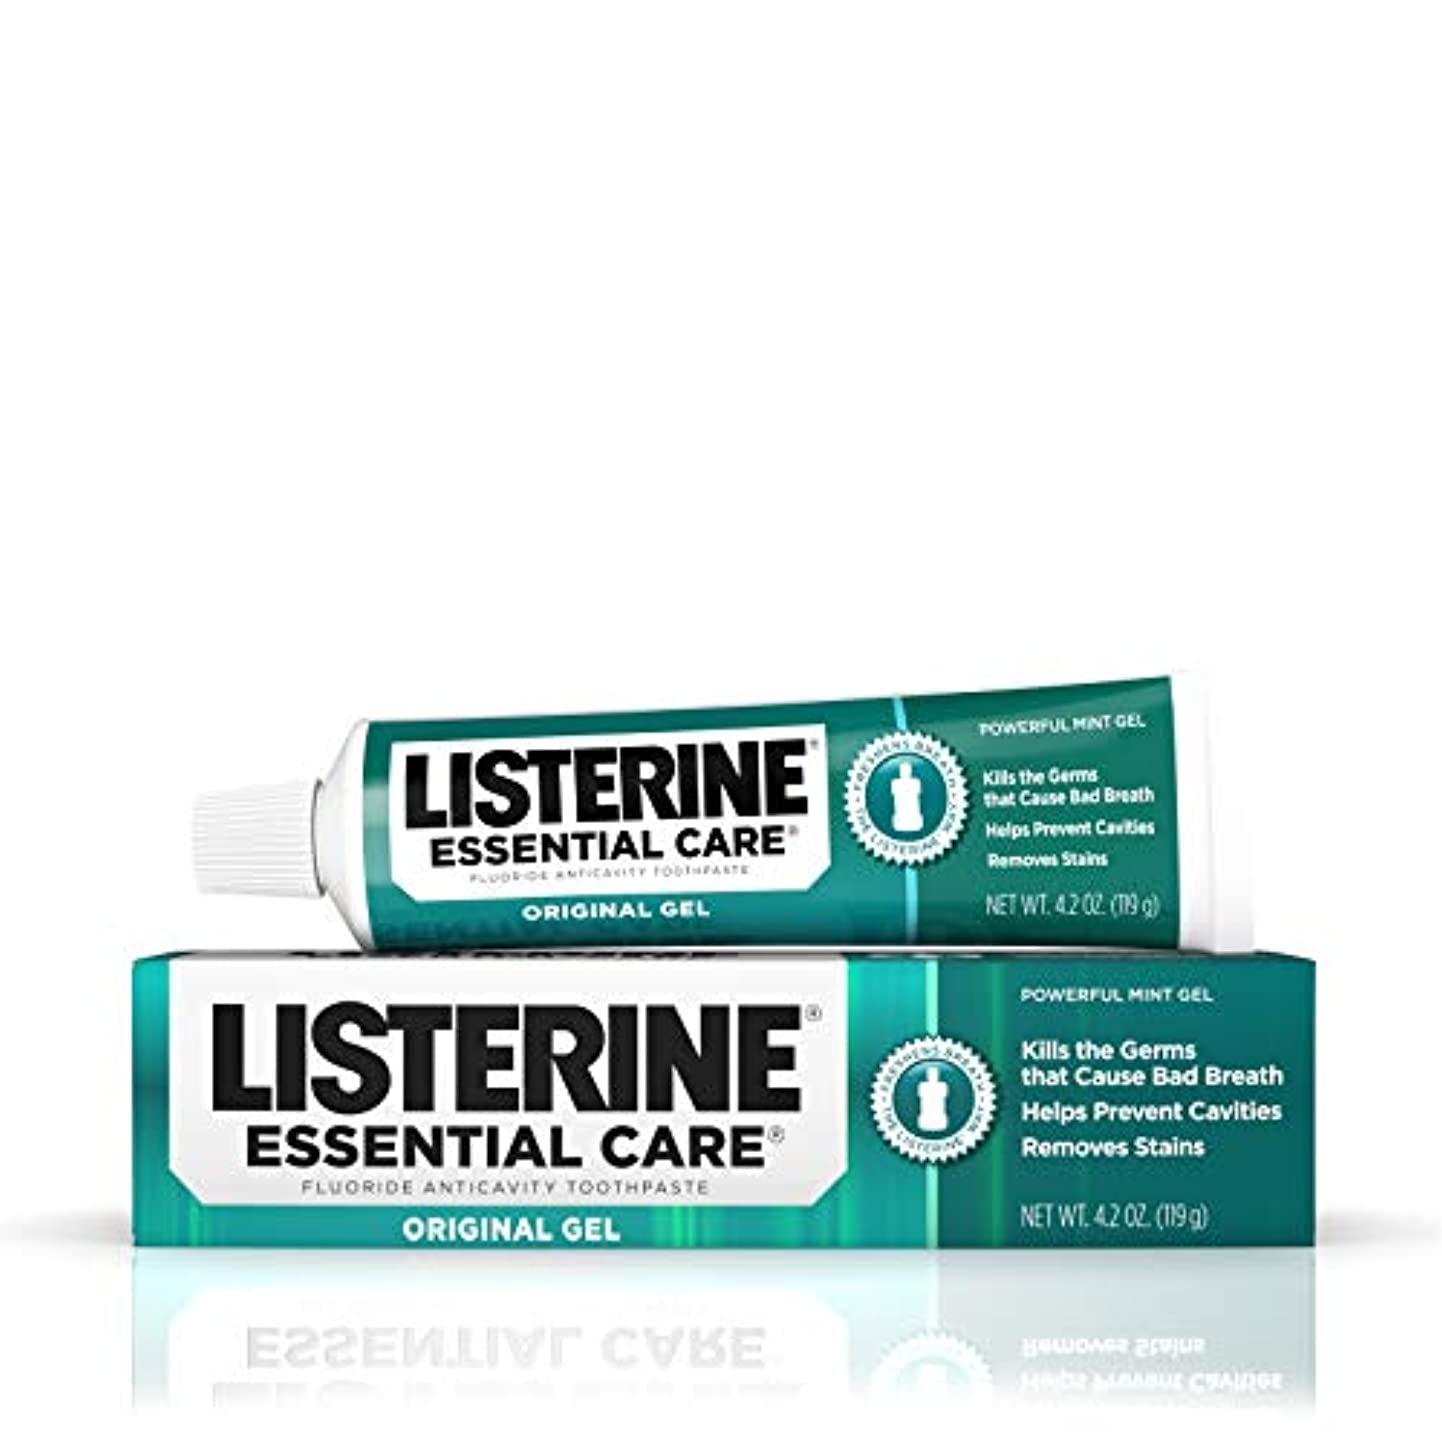 スリーブ多用途保証海外直送品Listerine Essential Care Toothpaste Gel Original, Powerful Mint 4.2 oz by Listerine